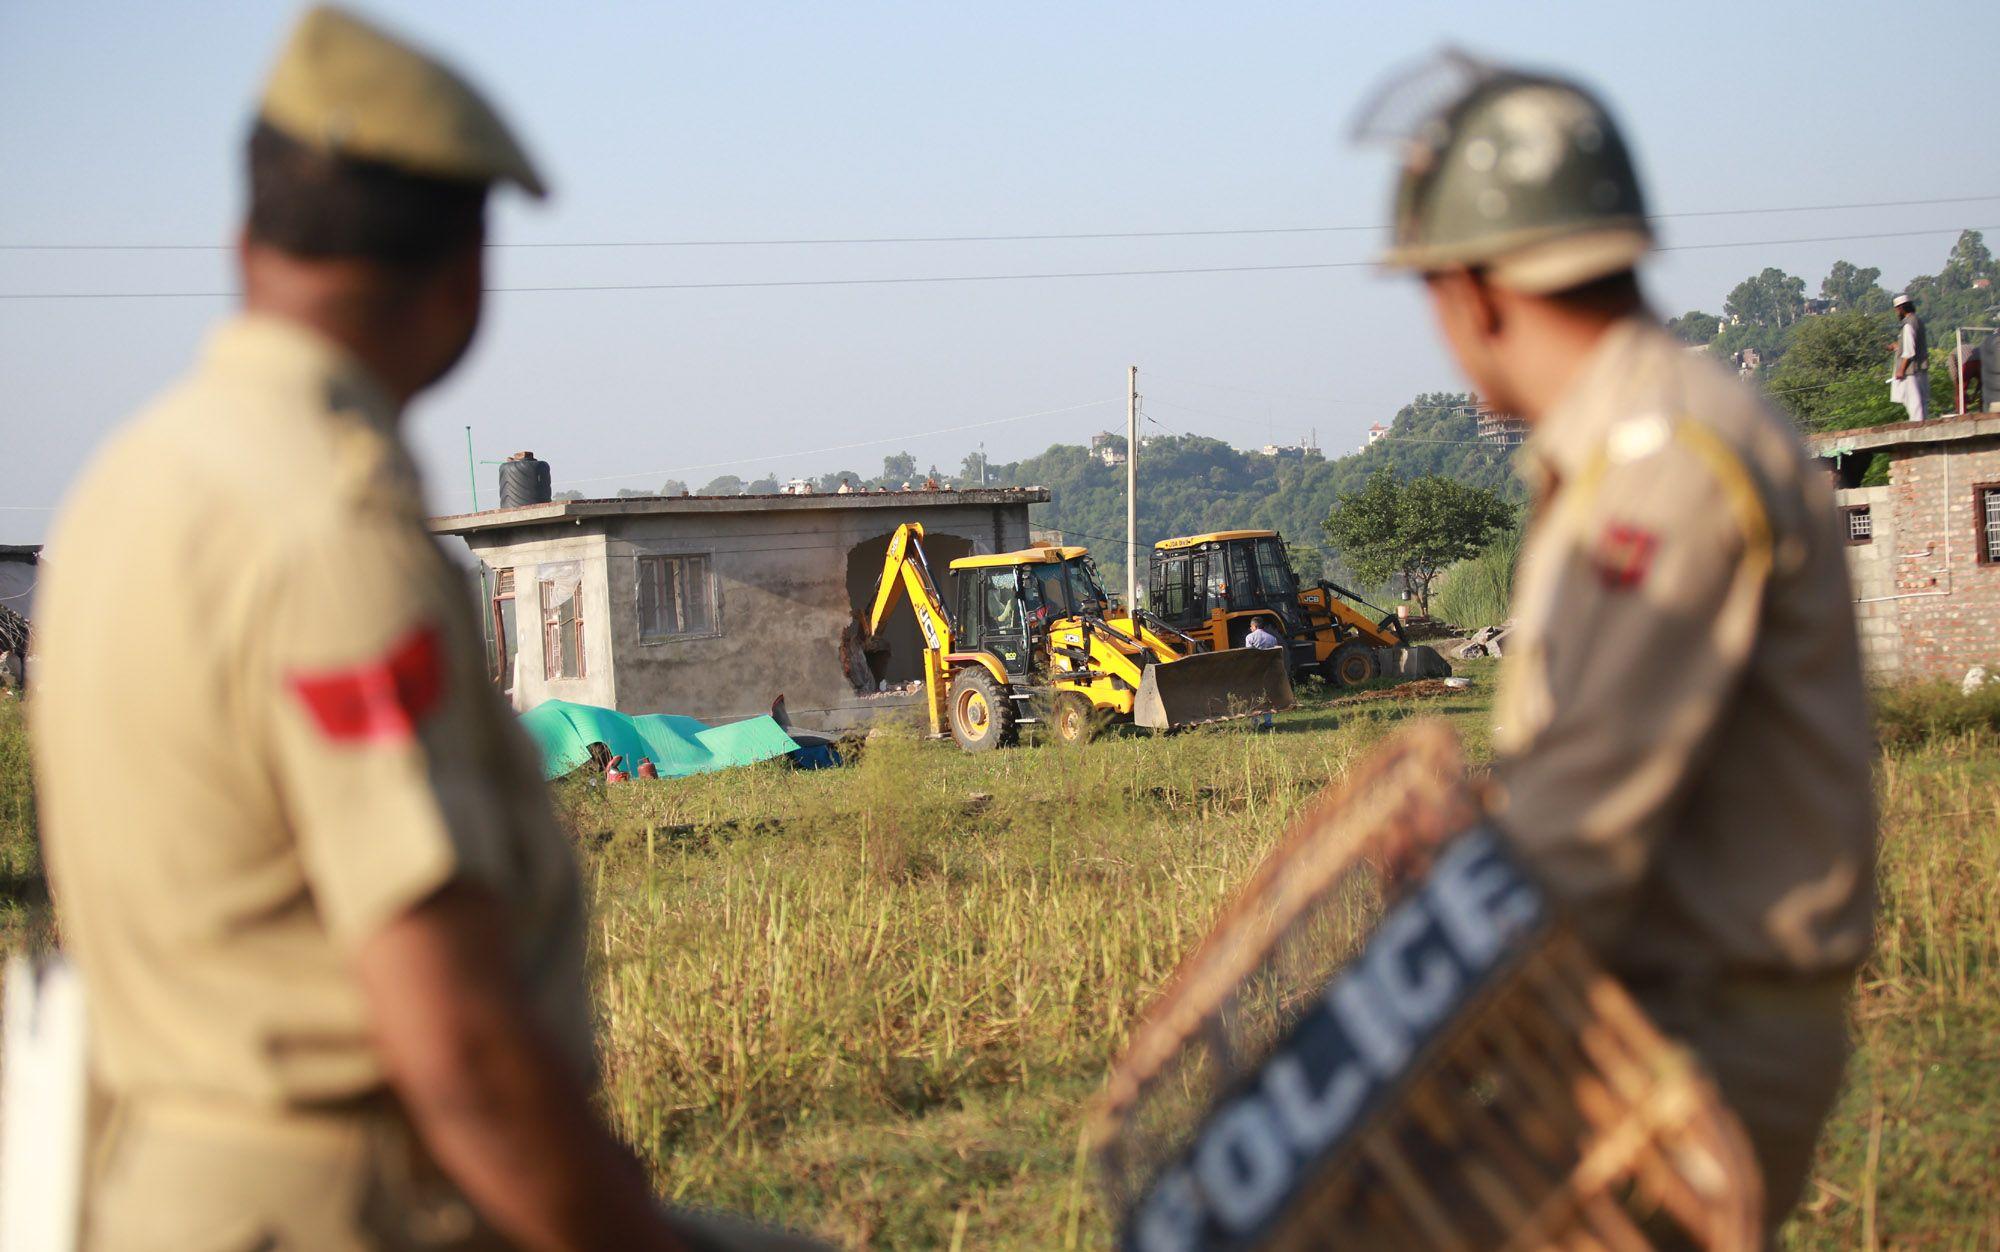 Jda Launches A Massive Anti Encroachment Drive To Demolish Illegal